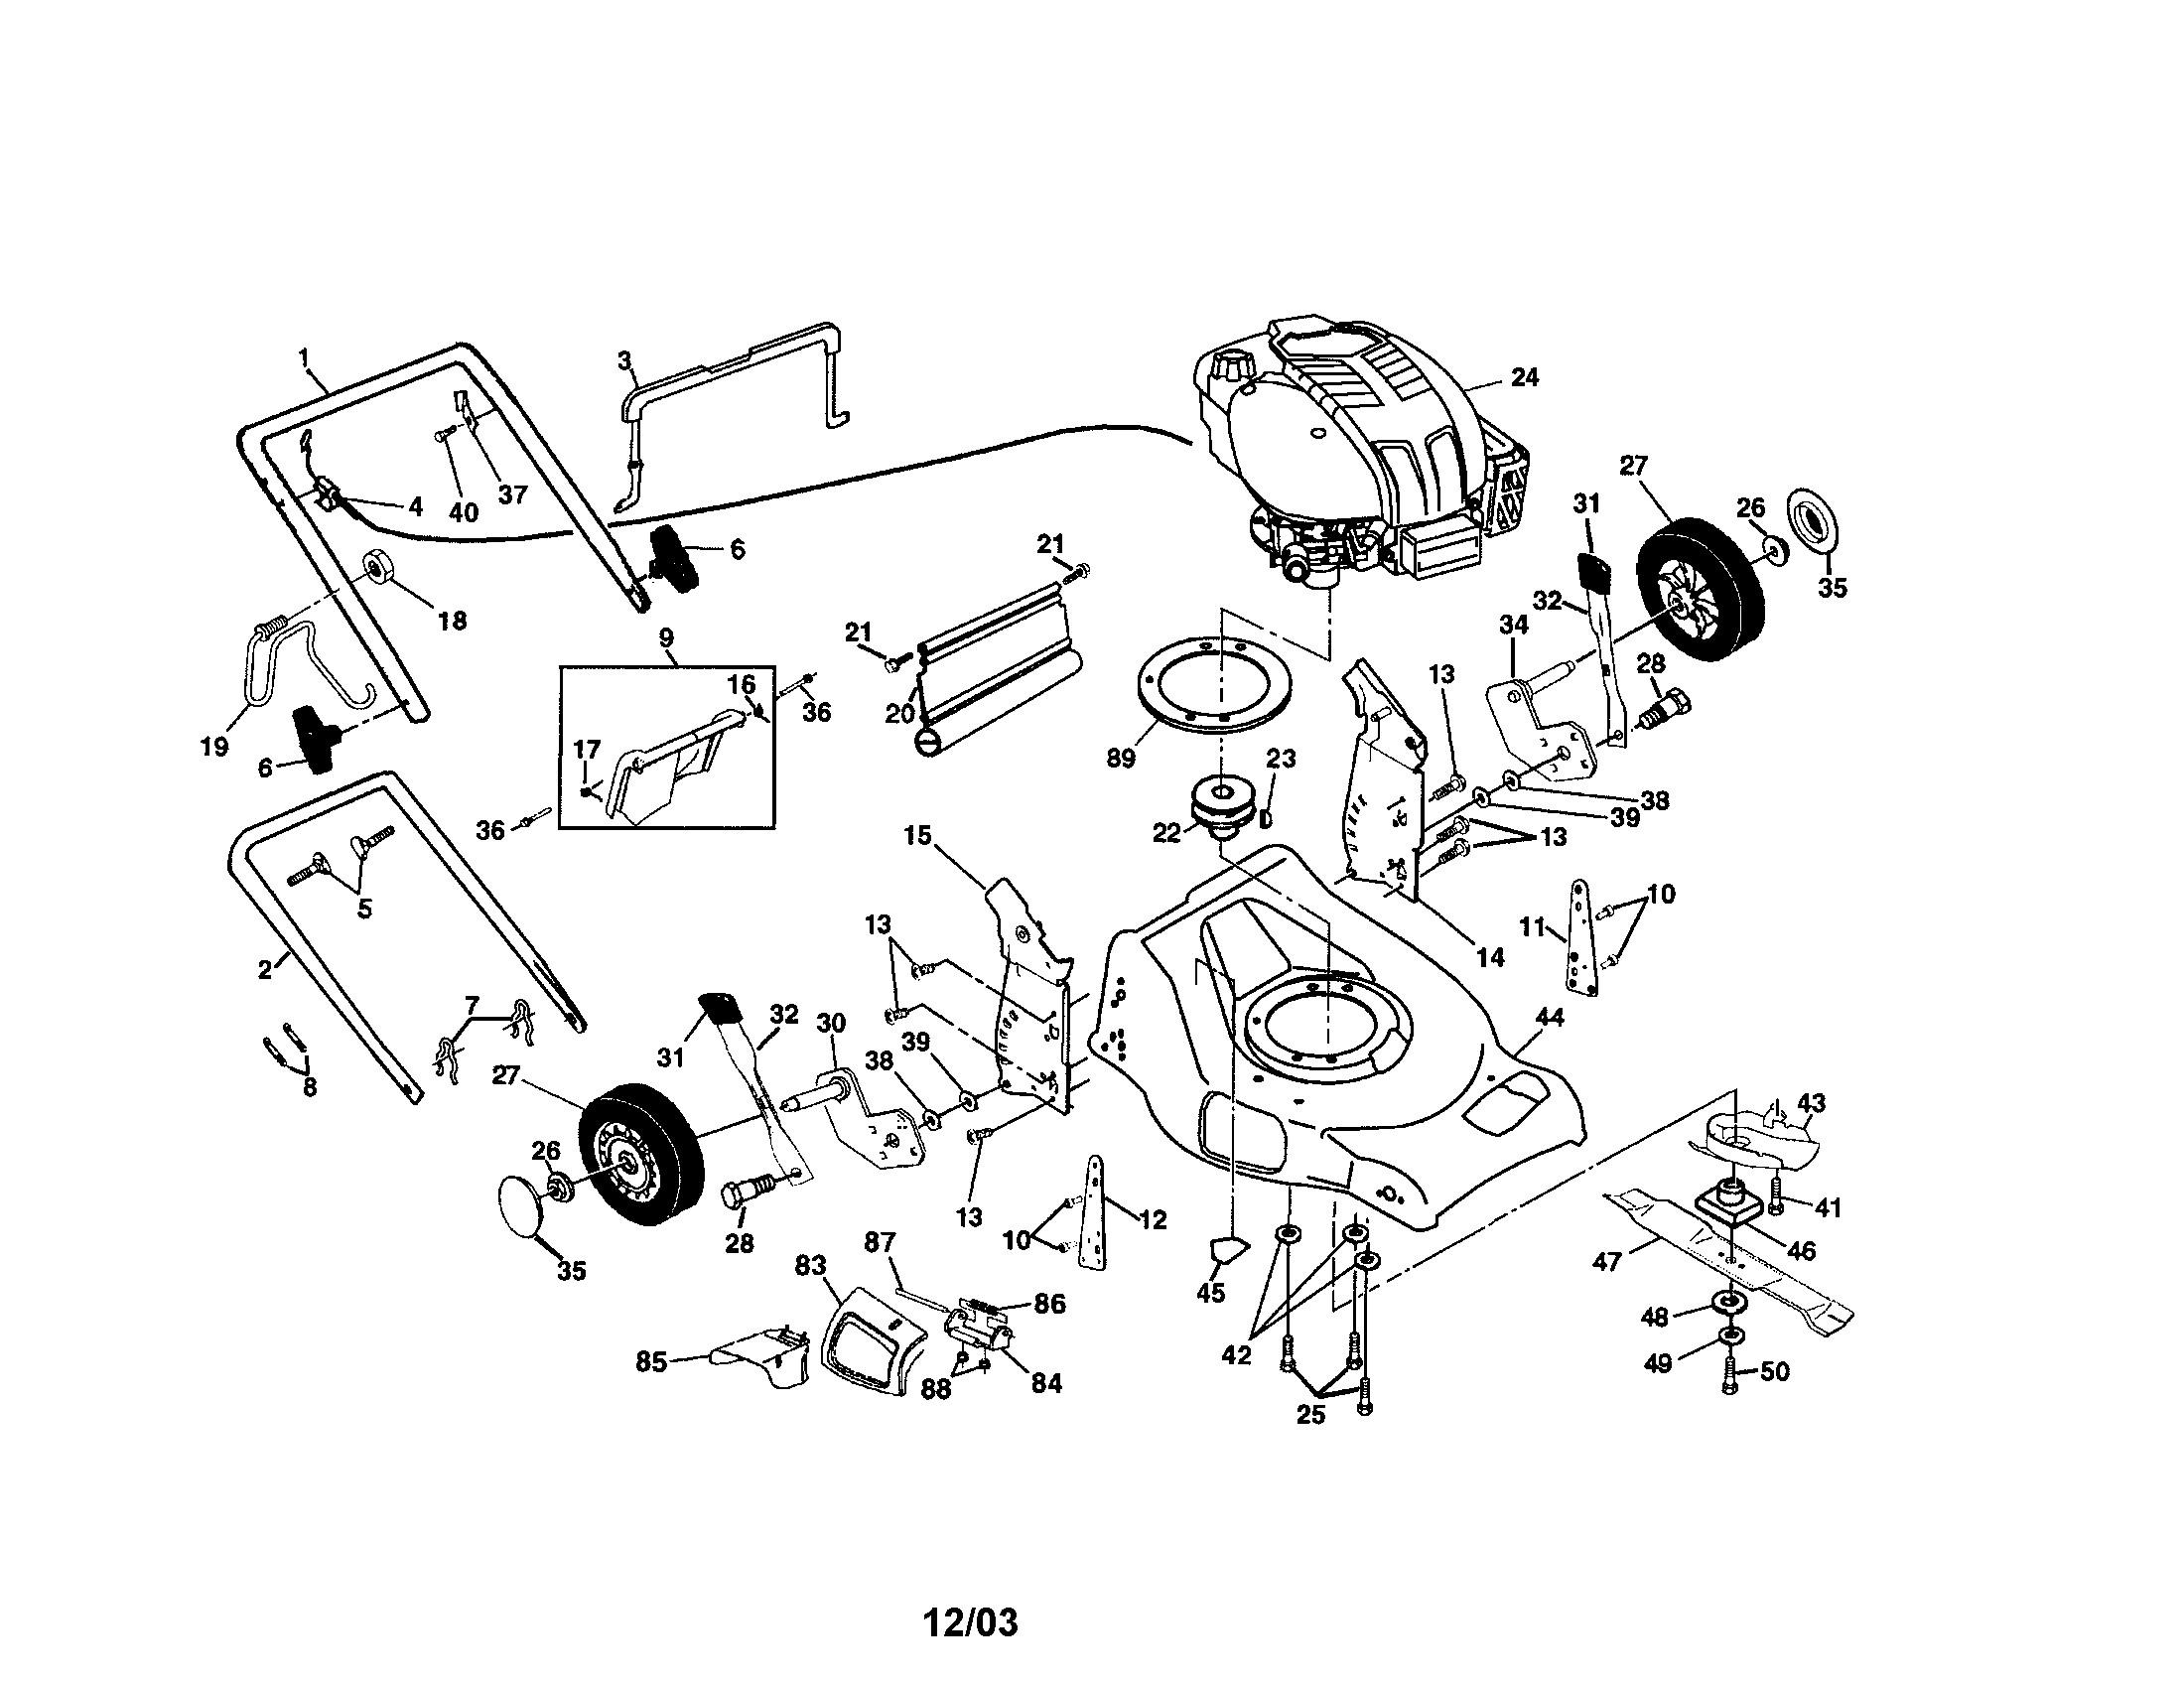 Lawn Mower Engine Parts Diagram Looking for Craftsman Model Gas Walk Behind Mower Of Lawn Mower Engine Parts Diagram